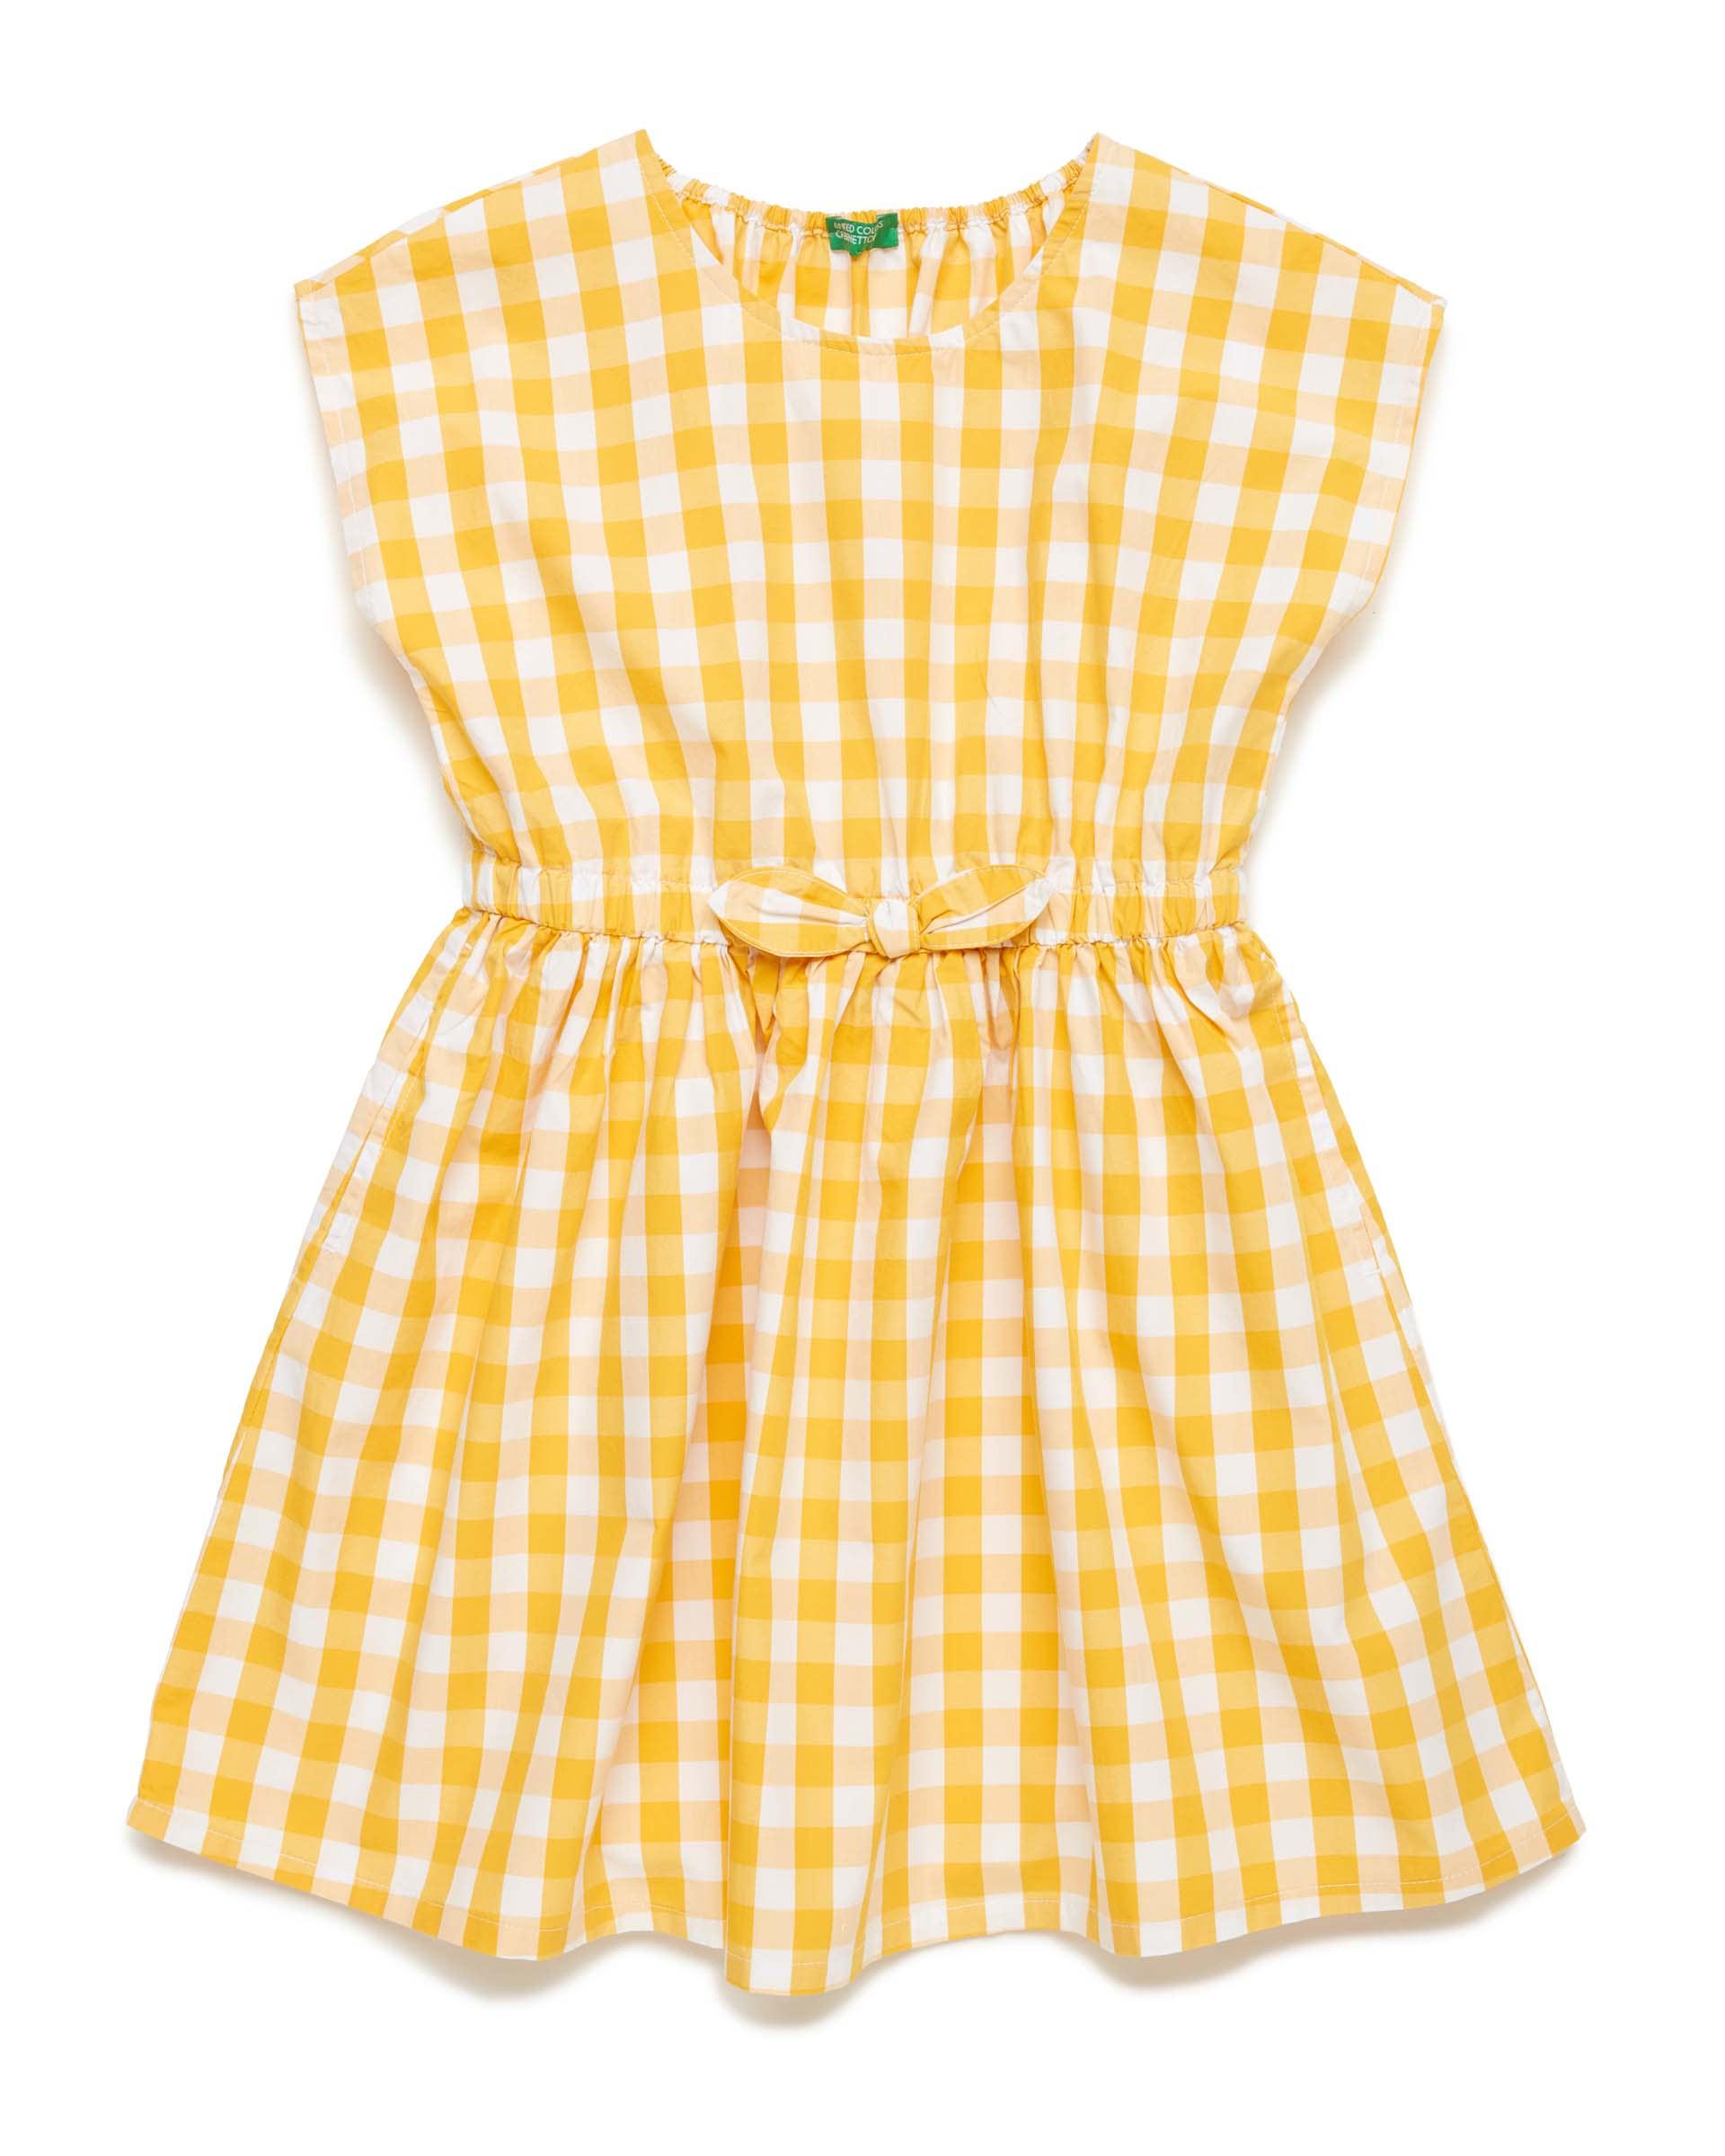 20P_4OT75VDG0_911, Платье для девочек Benetton 4OT75VDG0_911 р-р 140, United Colors of Benetton, Платья для девочек  - купить со скидкой